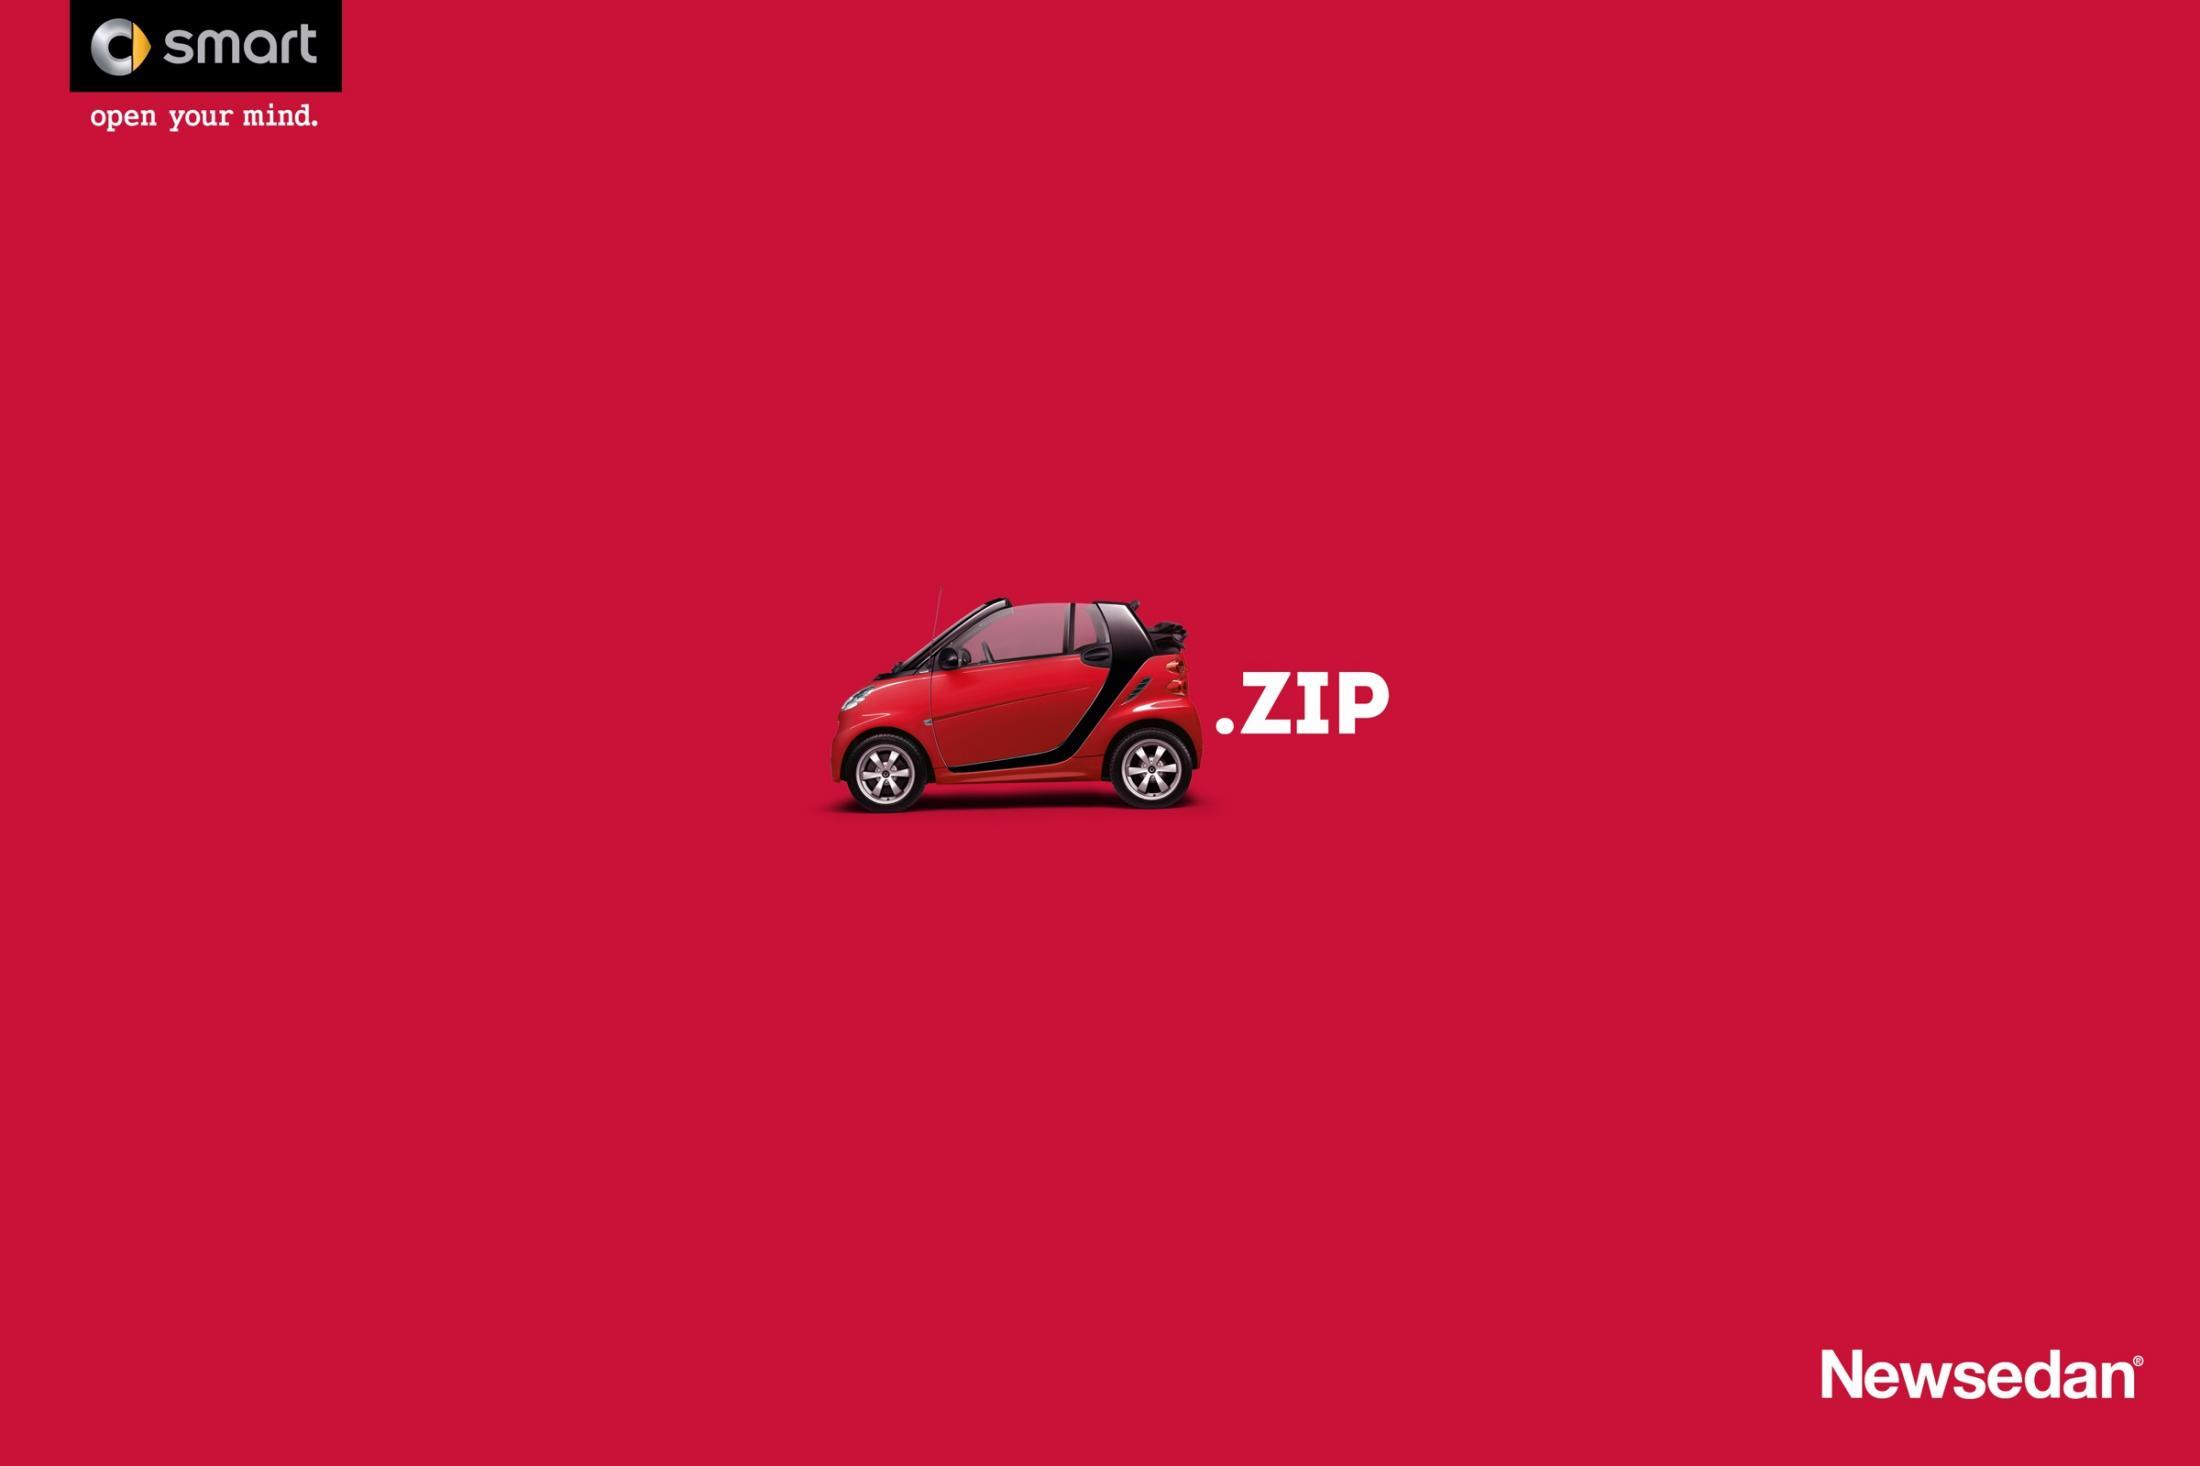 Newsedan Print Ad -  Zip